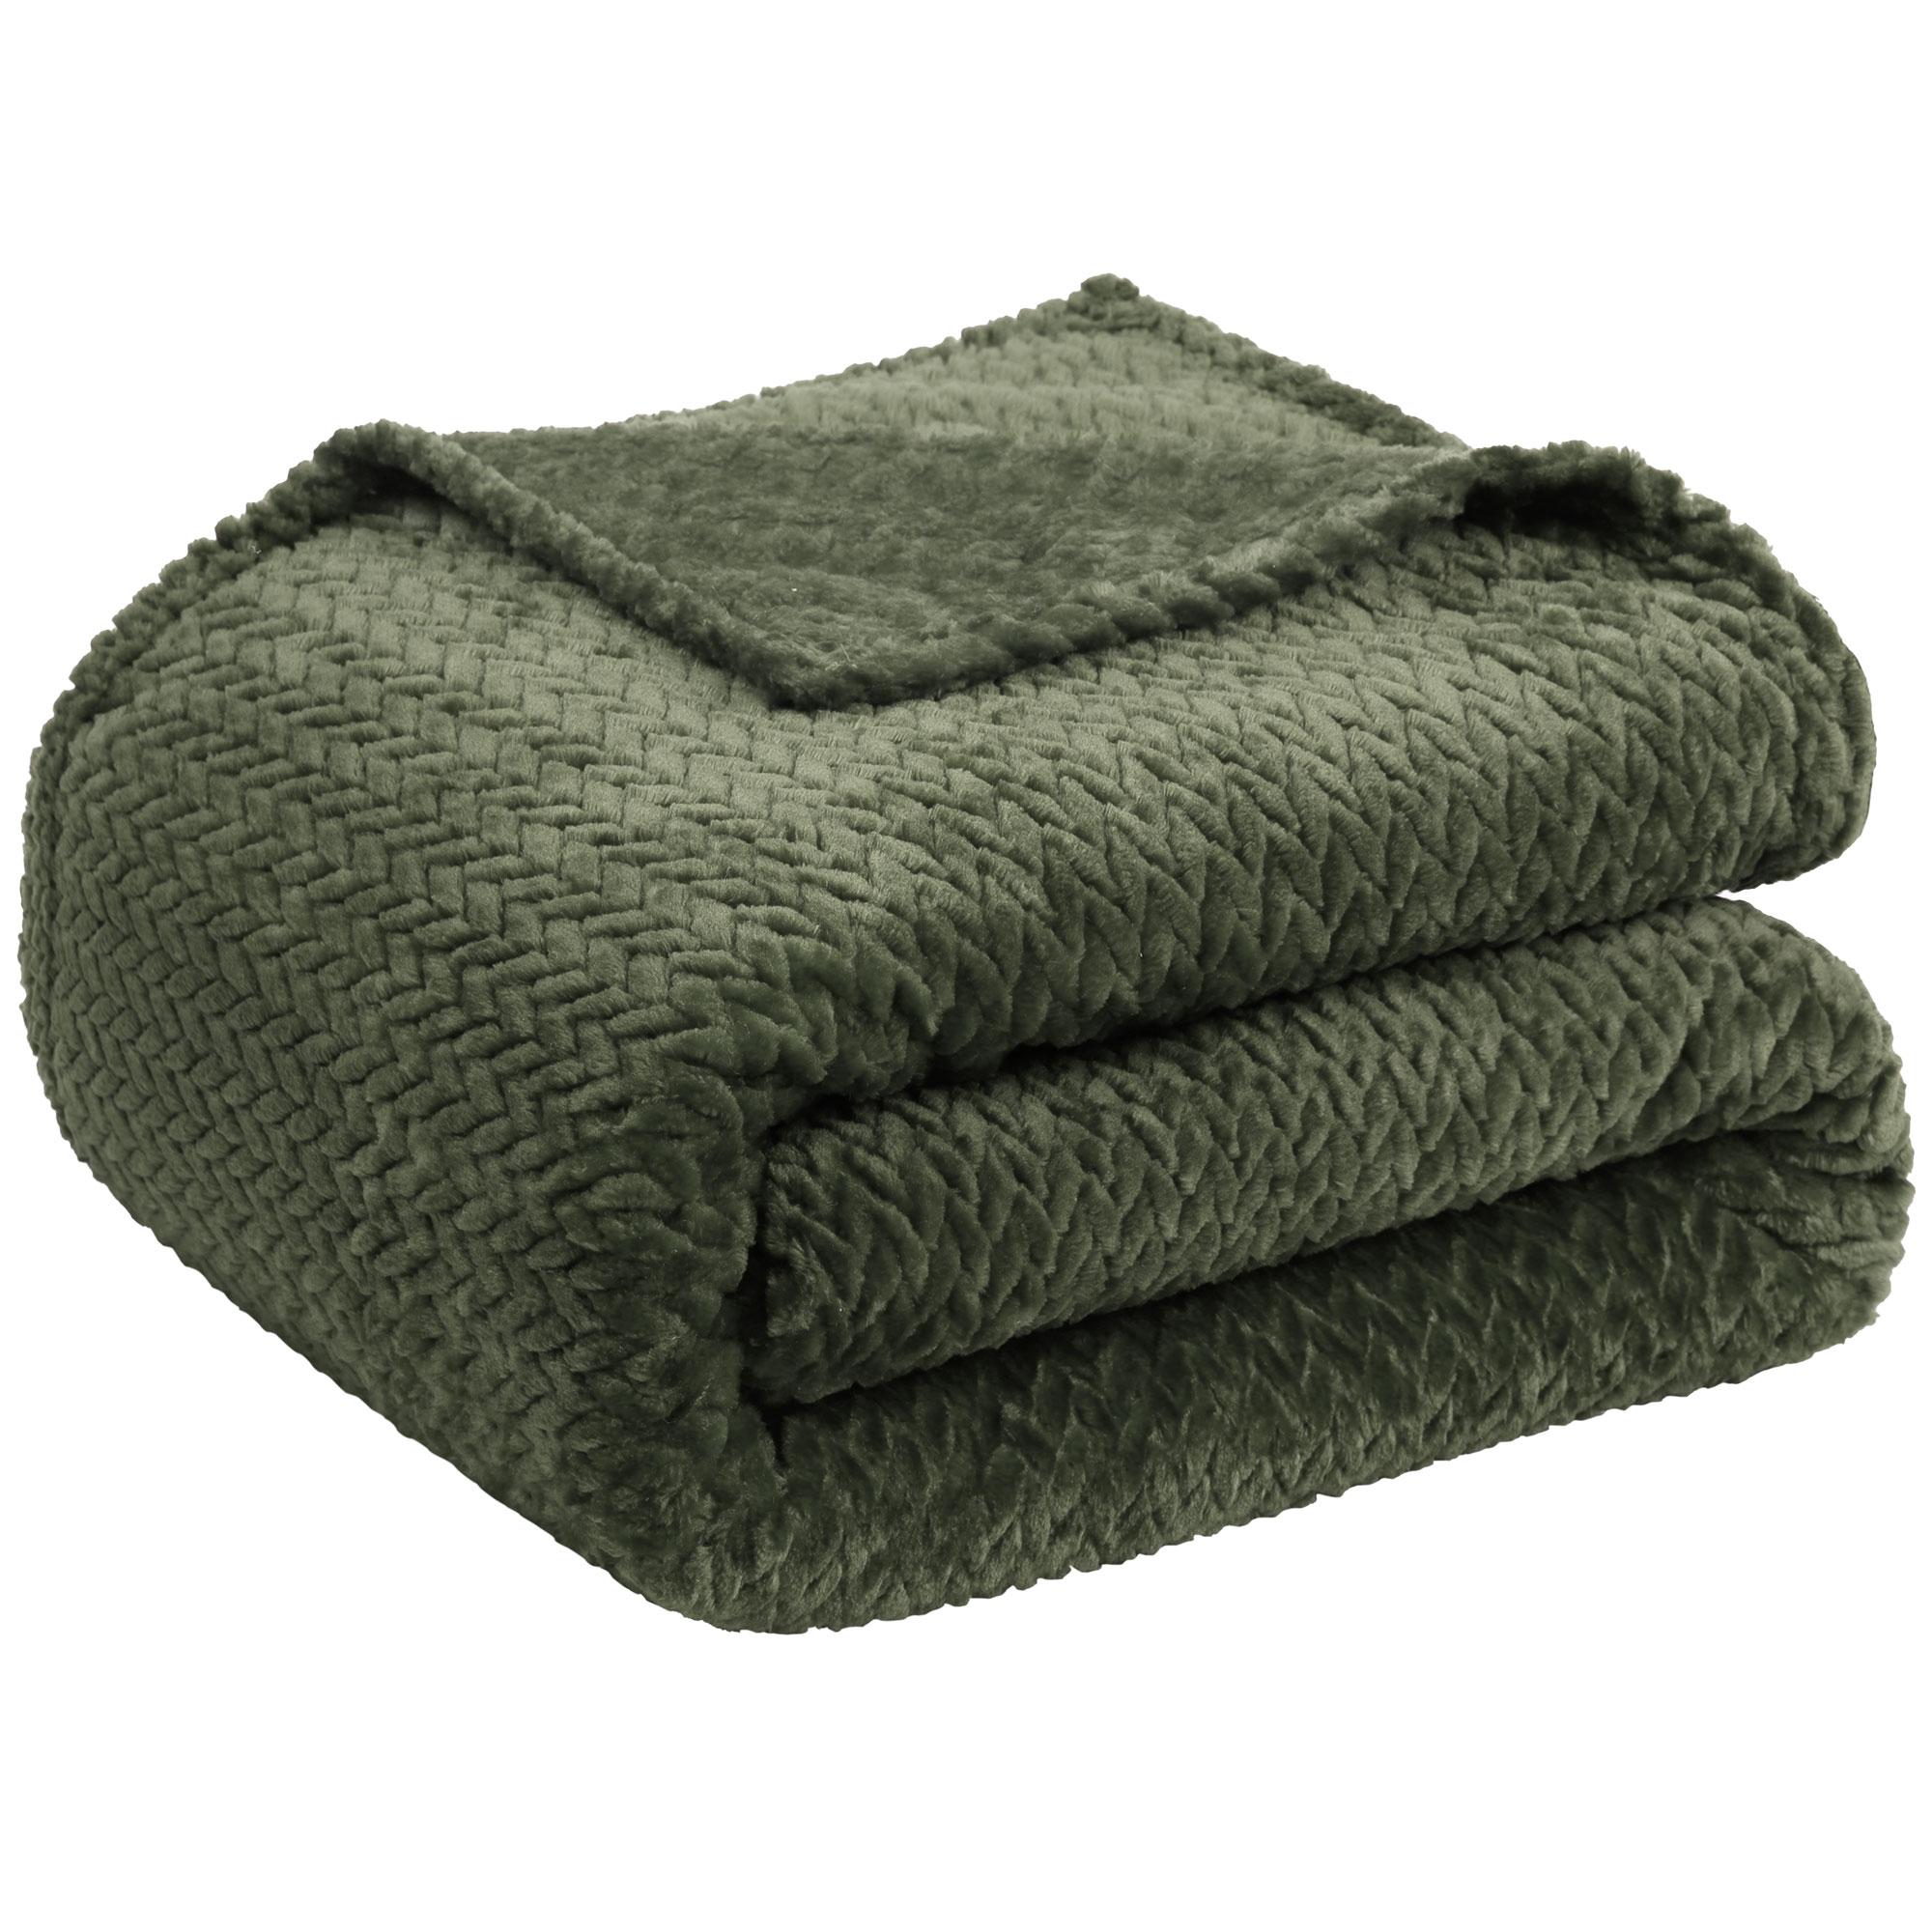 "New Luxury Leaves Twins Fleece Warm Large Sofa Blankets 59"" x 78"" Army Green"